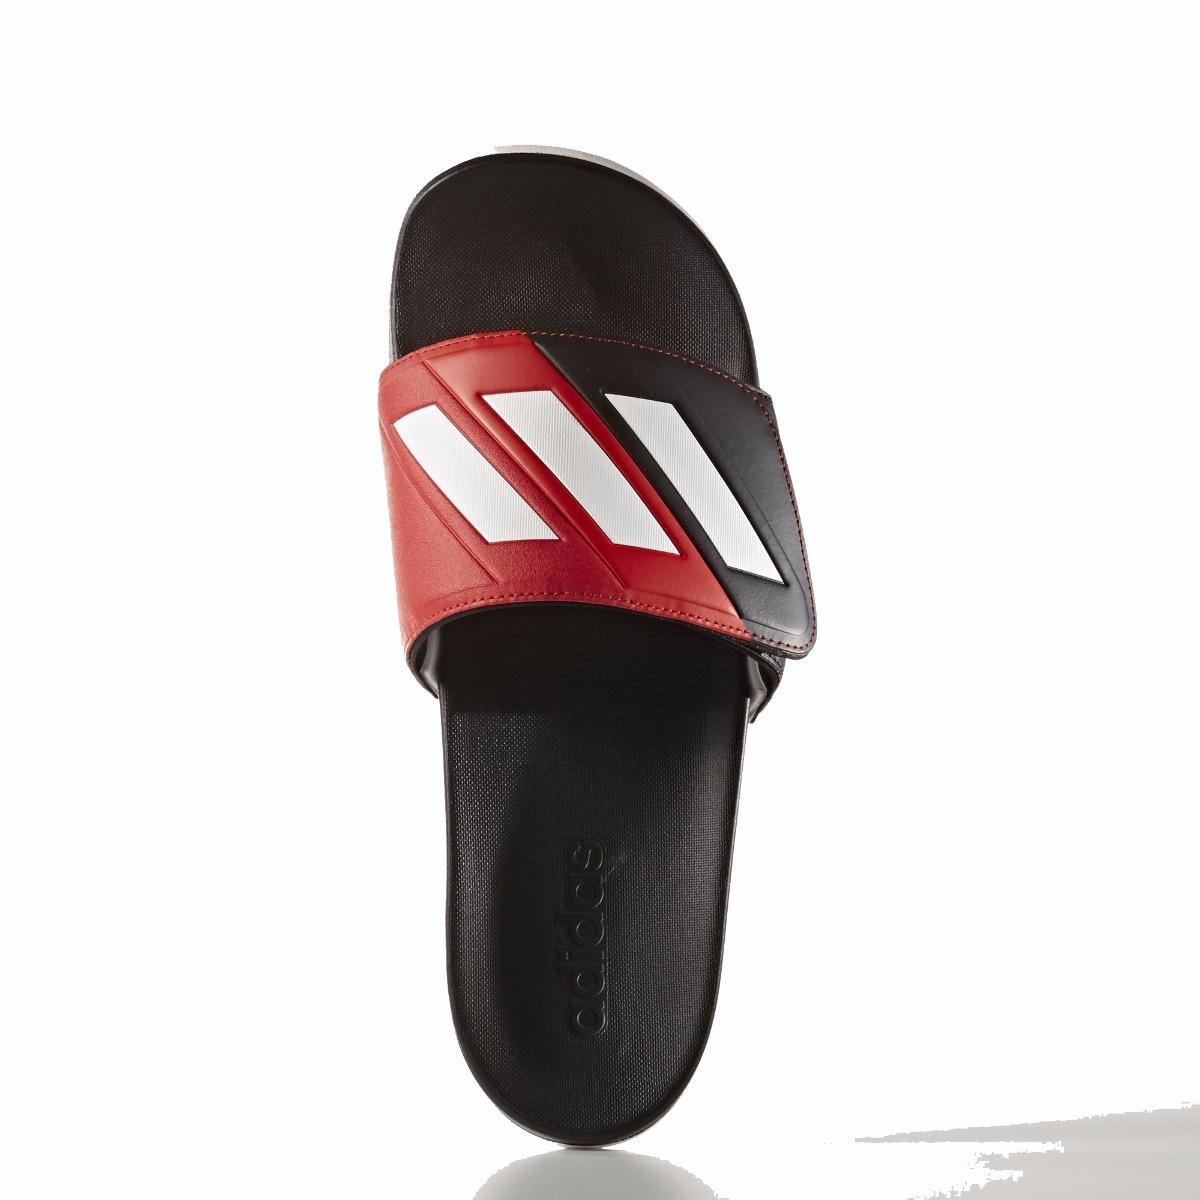 pretty nice c7548 5da7d ojotas chinelas adidas adilette cf plus  brand sports. Cargando zoom.